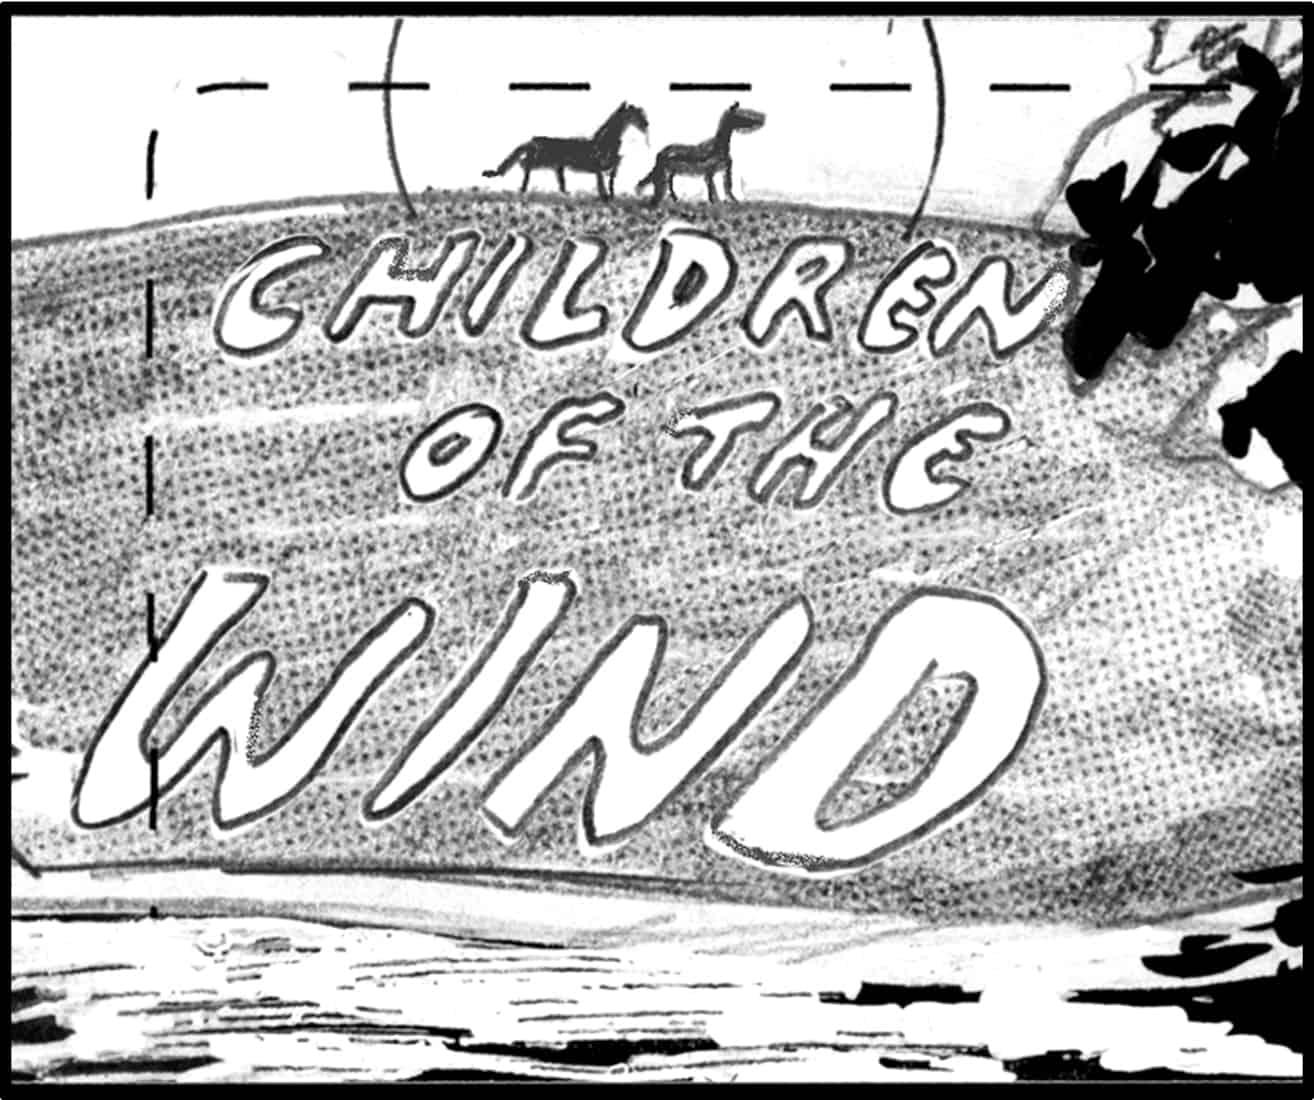 Children_of_the_Wind_Sc_94_Pnl_4